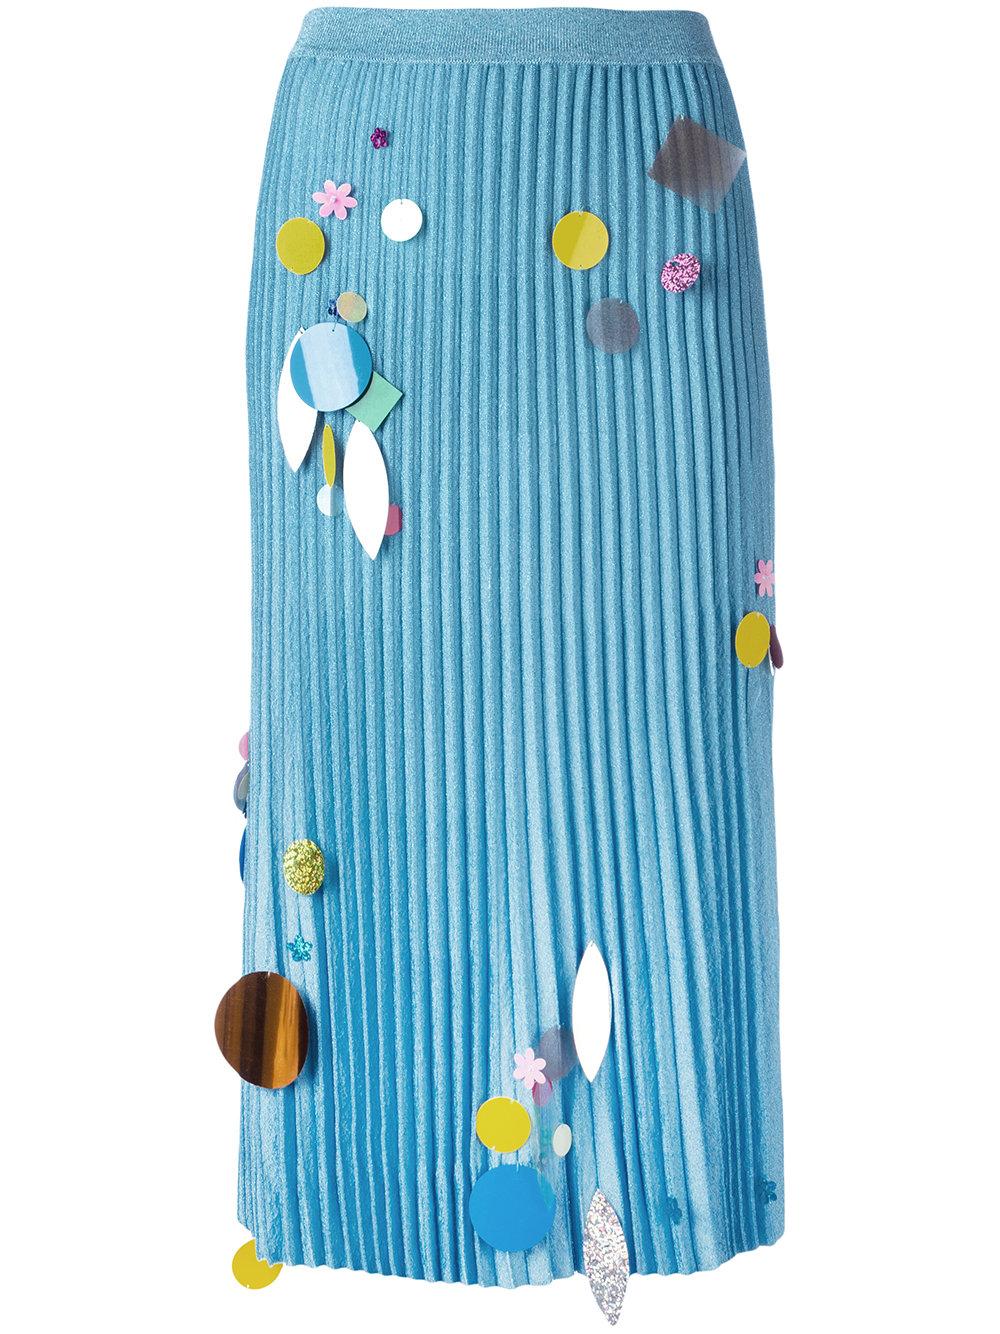 Christopher Kane - pleated sequin detail knitted skirt, $673